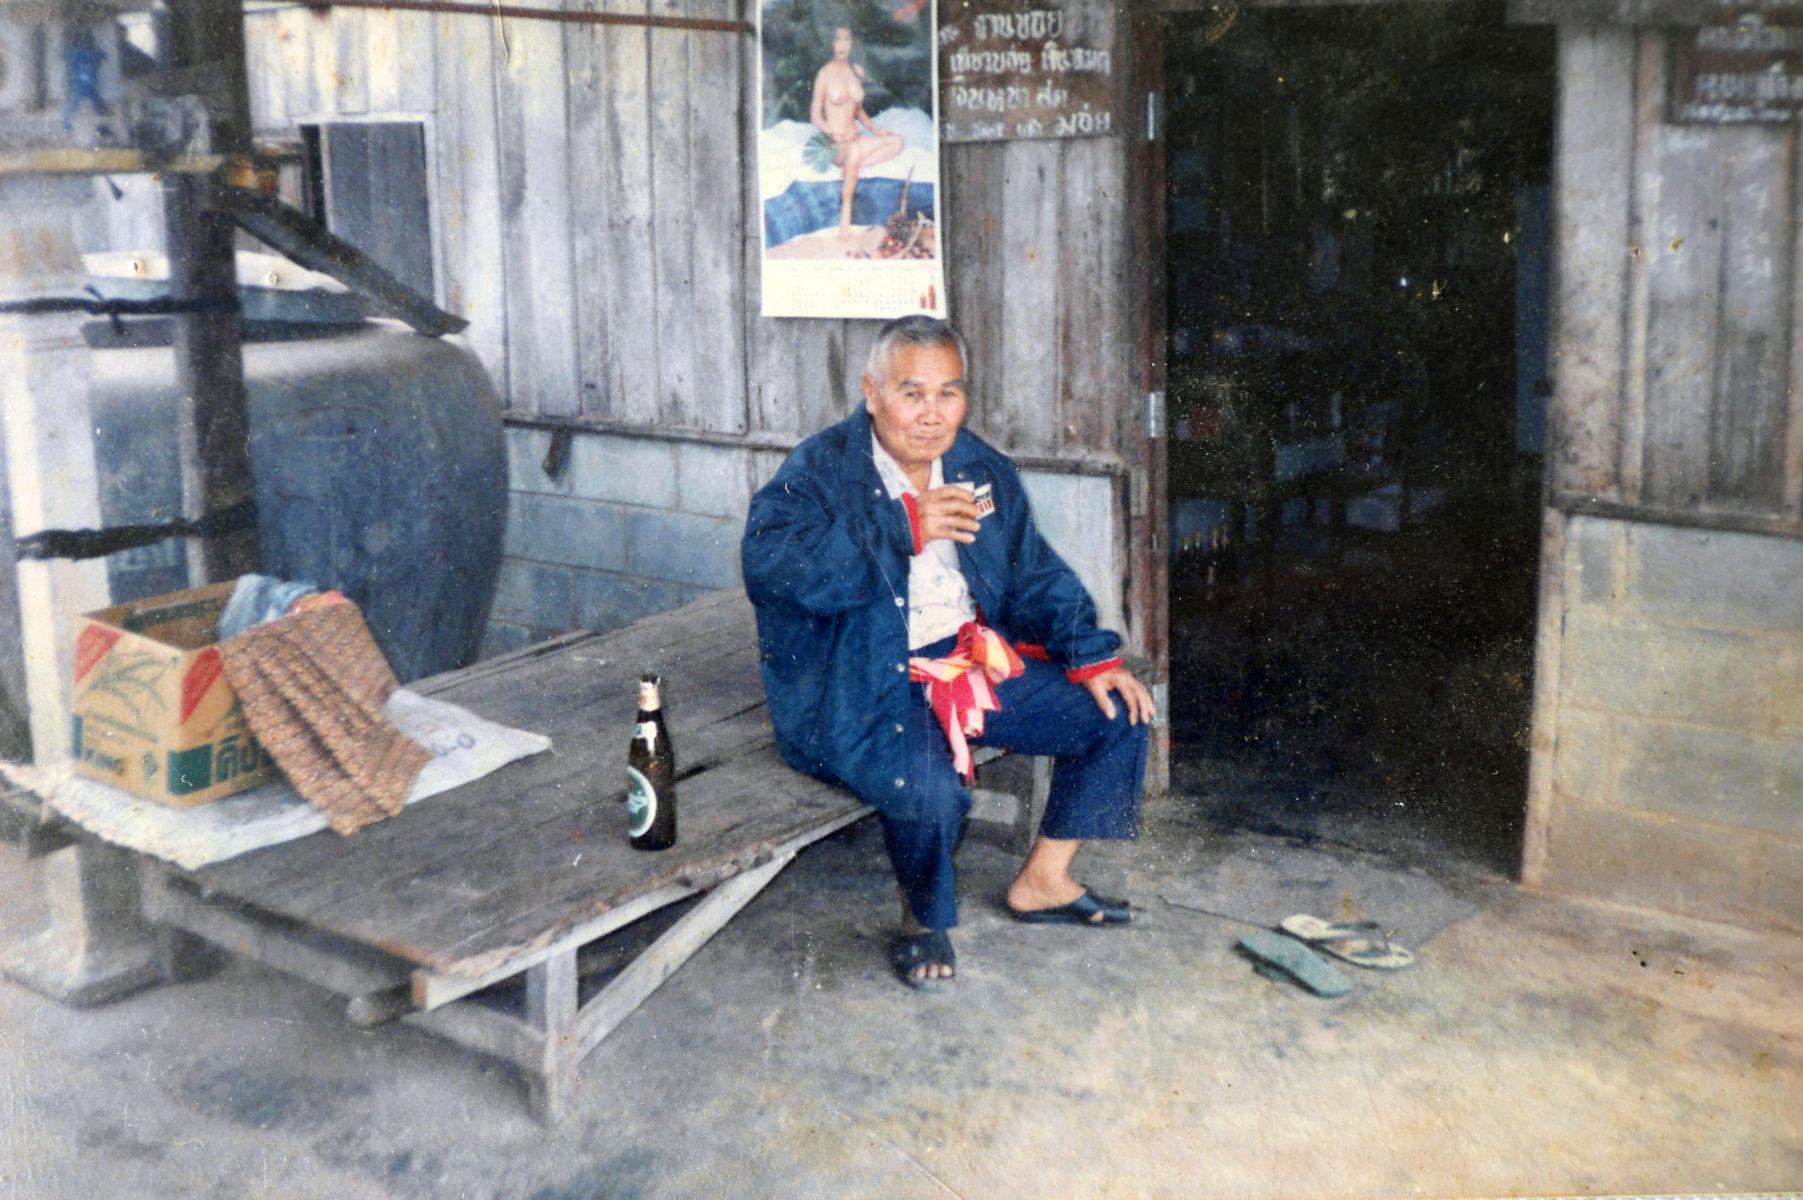 bild 1 © Srikhoon Jiangkratok, 1994.